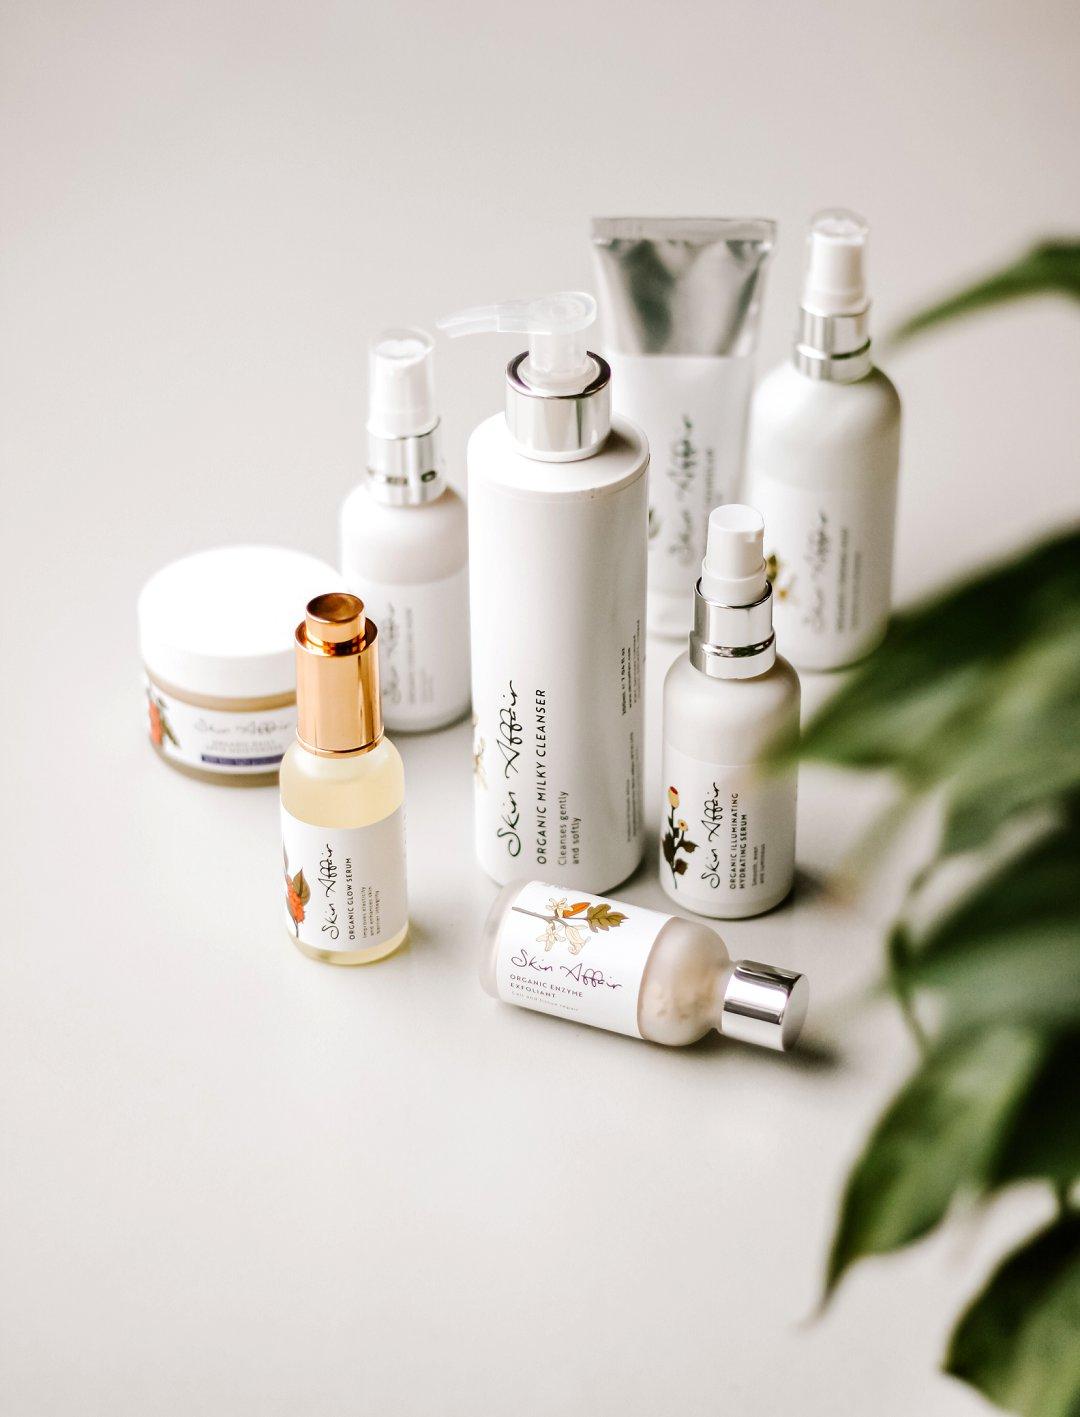 Skin Affair - We Love Your Skin